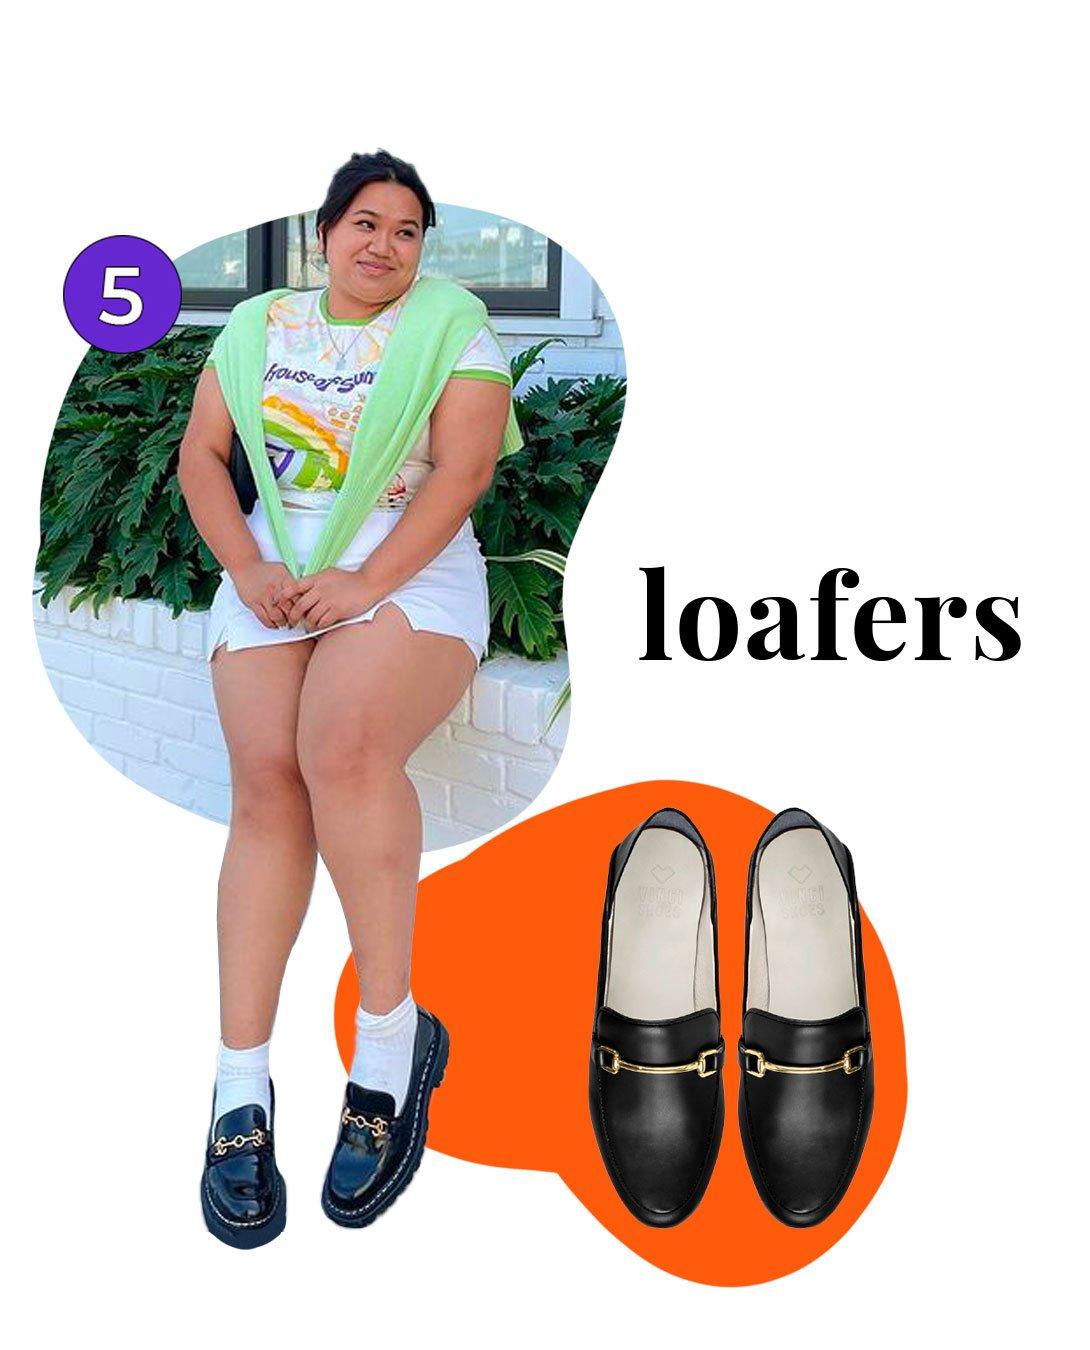 Lauren Licup - Street Style - tendência no verão - Verão - Steal the Look  - https://stealthelook.com.br